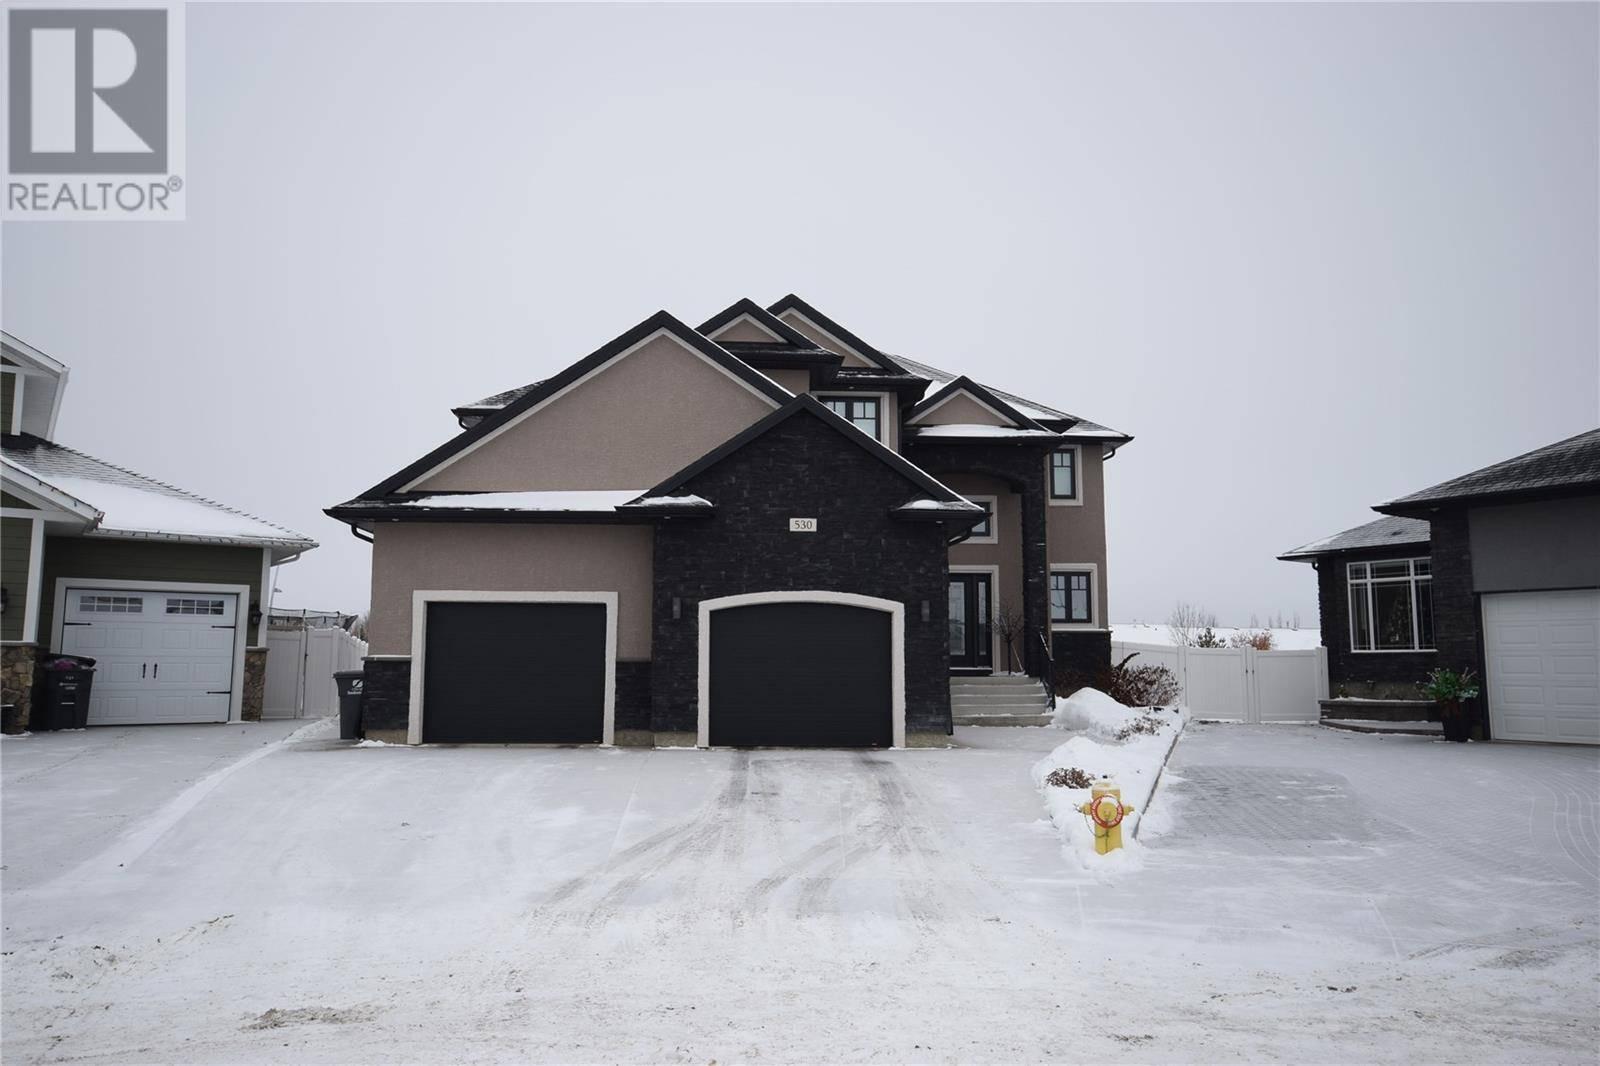 House for sale at 530 Sauer Ter  Saskatoon Saskatchewan - MLS: SK795916